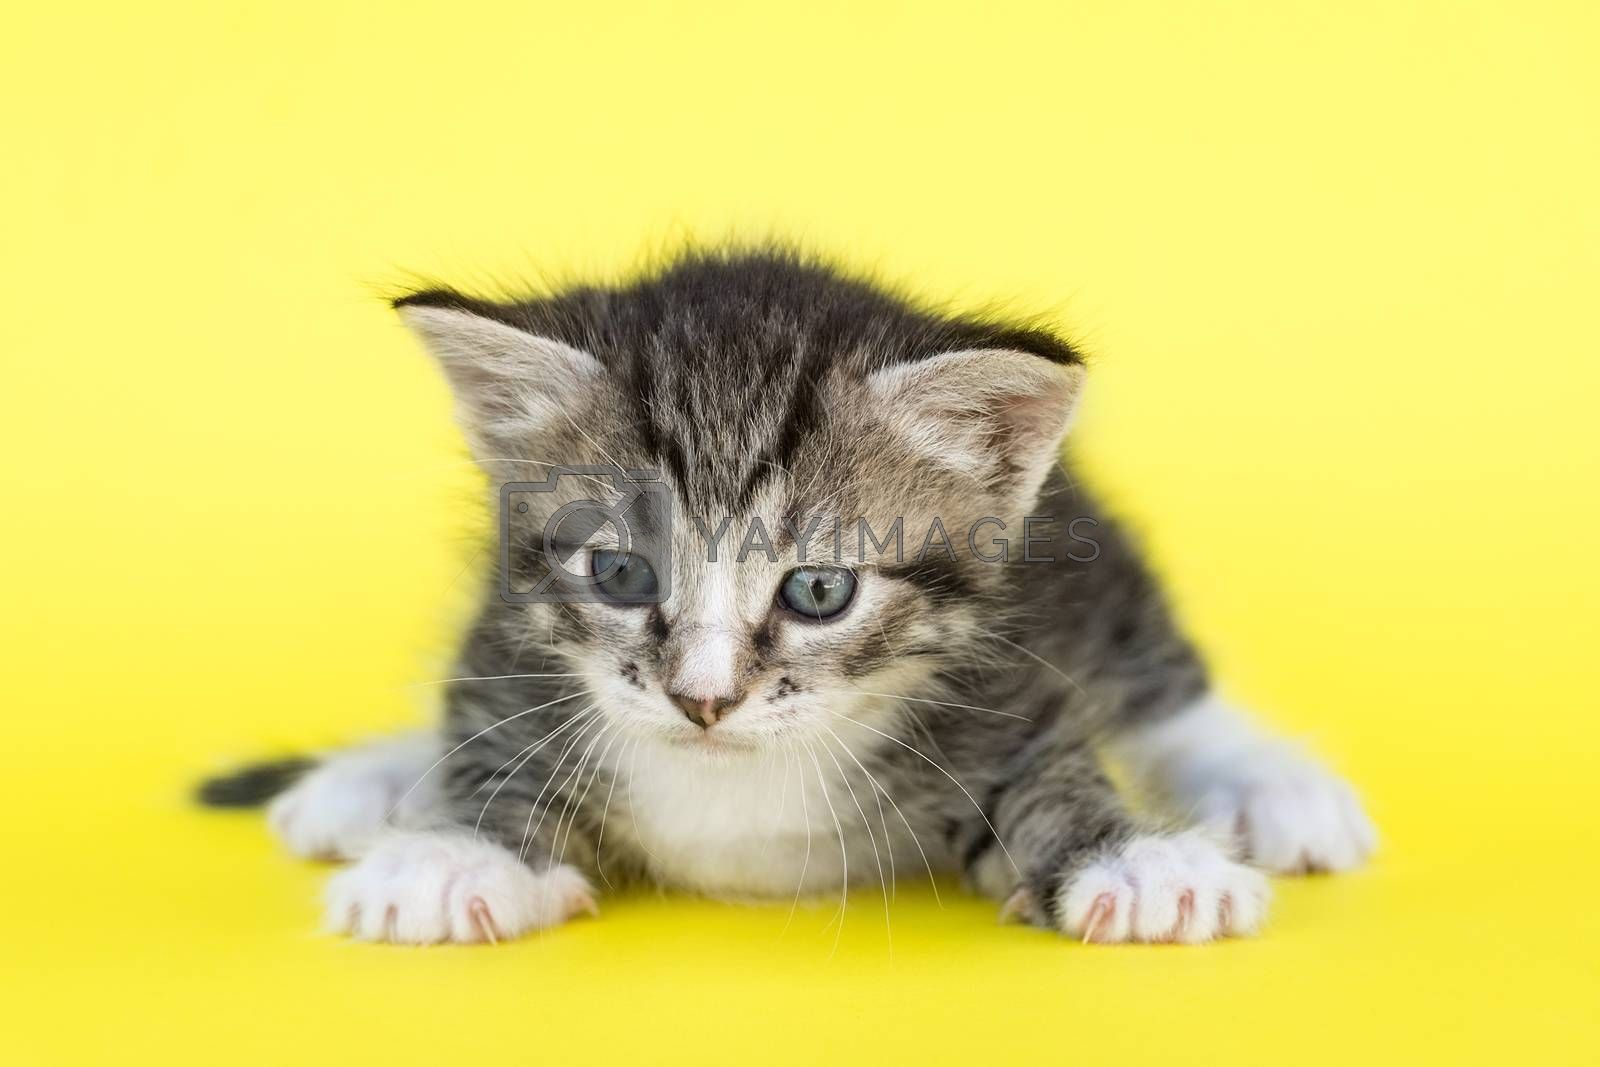 Little gray kitten on a yellow background